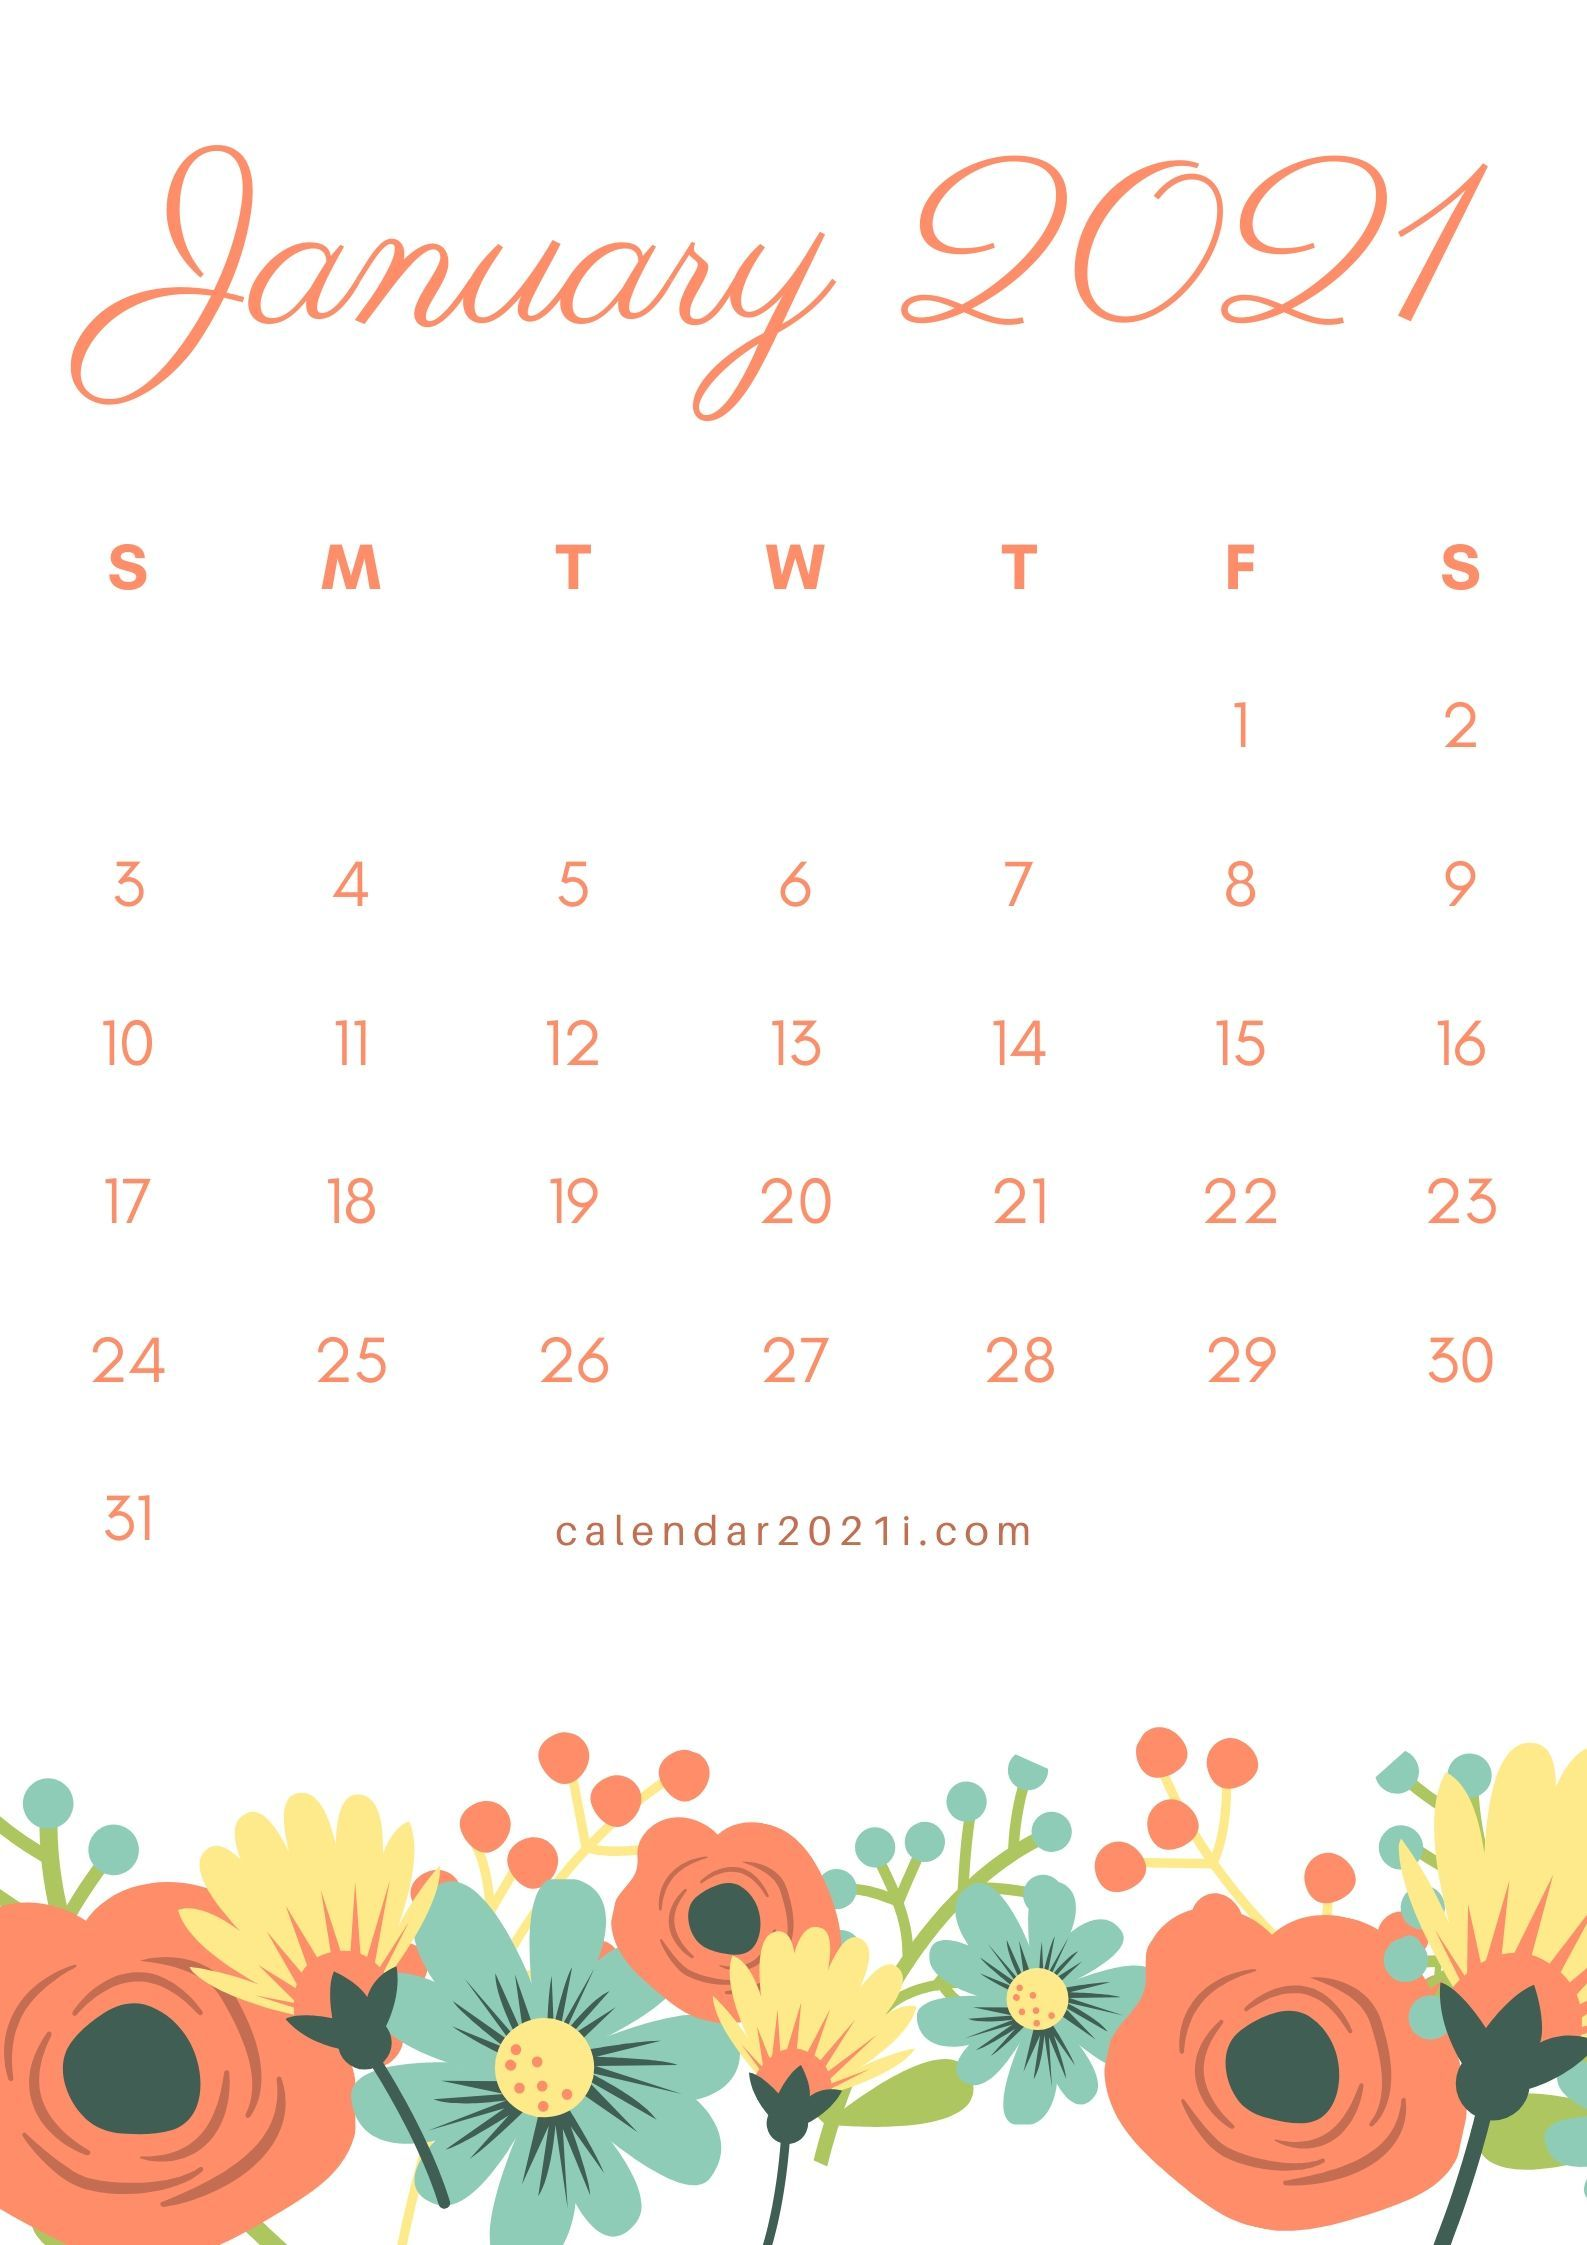 January 2021 Calendar Wallpapers 1587x2245